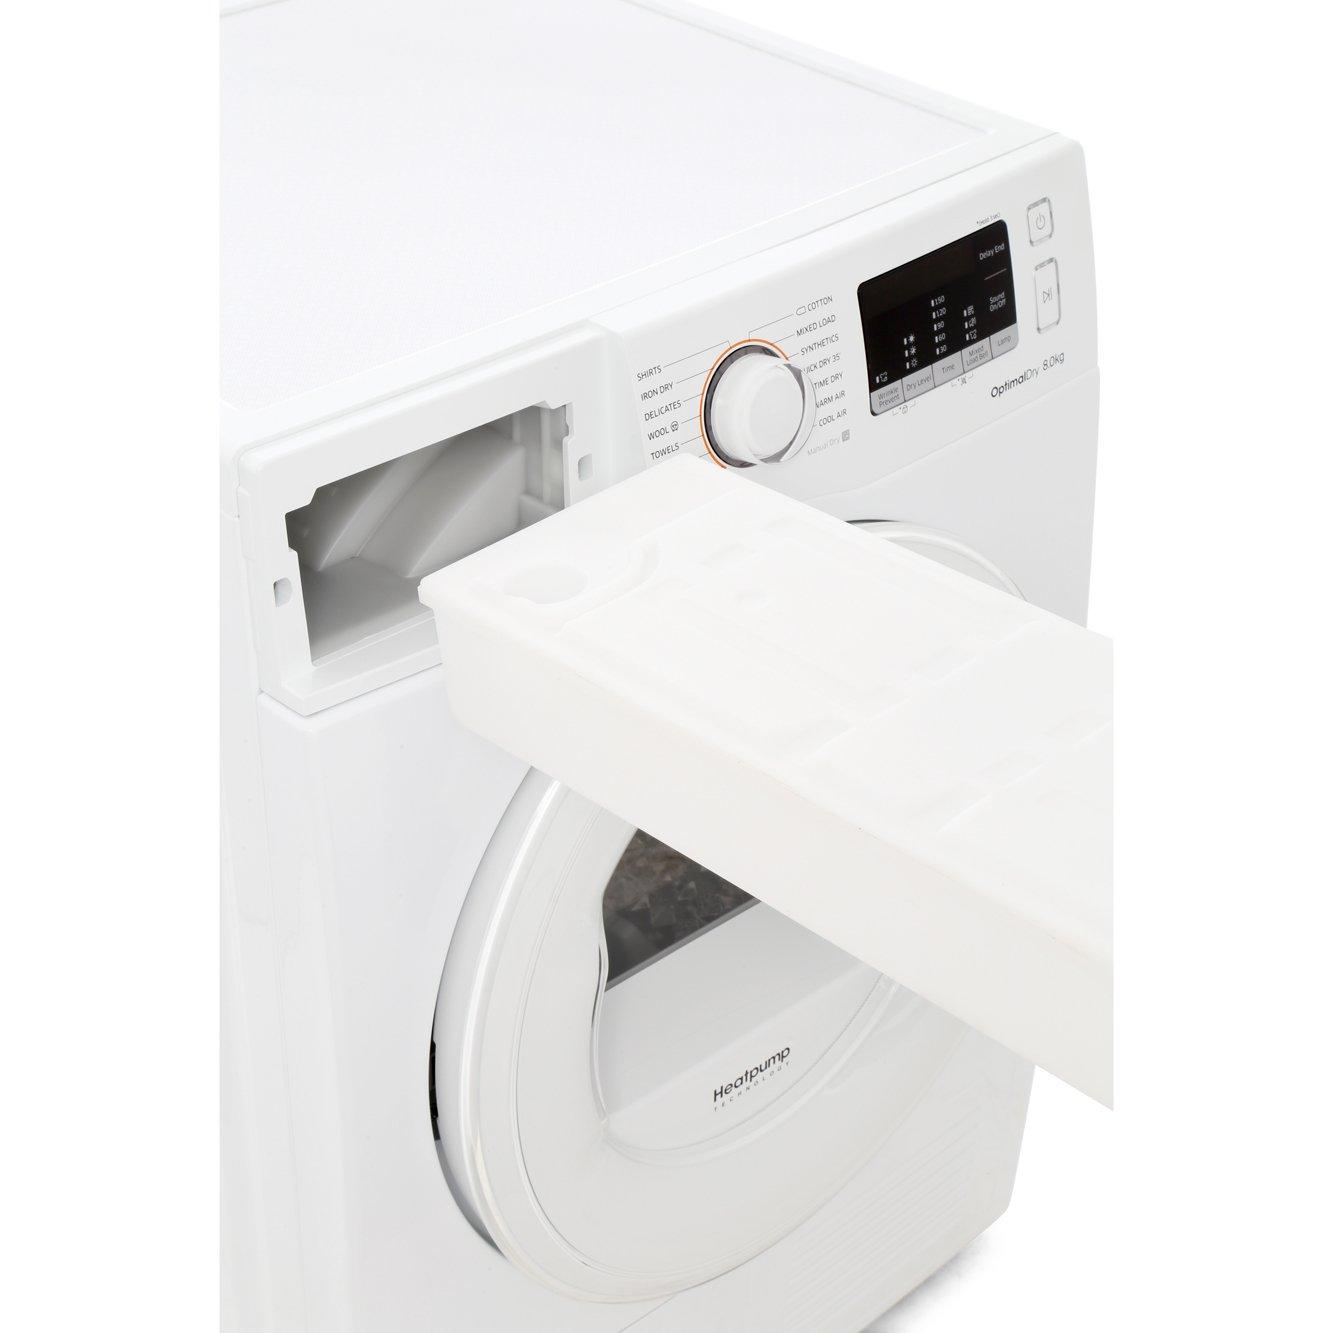 samsung heat pump dryer 8kg manual